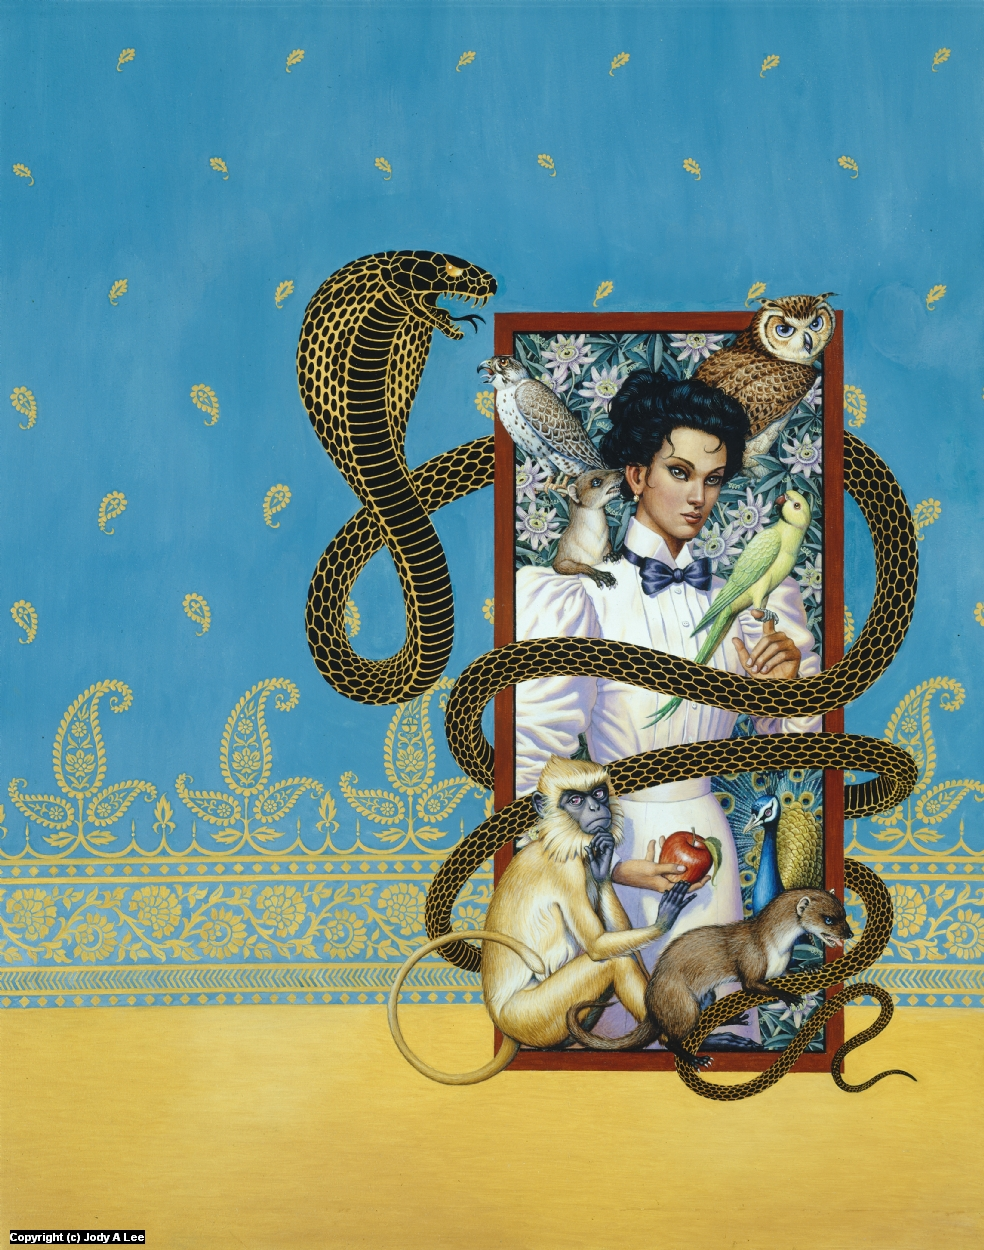 The Serpent's Shadow Artwork by Jody Lee